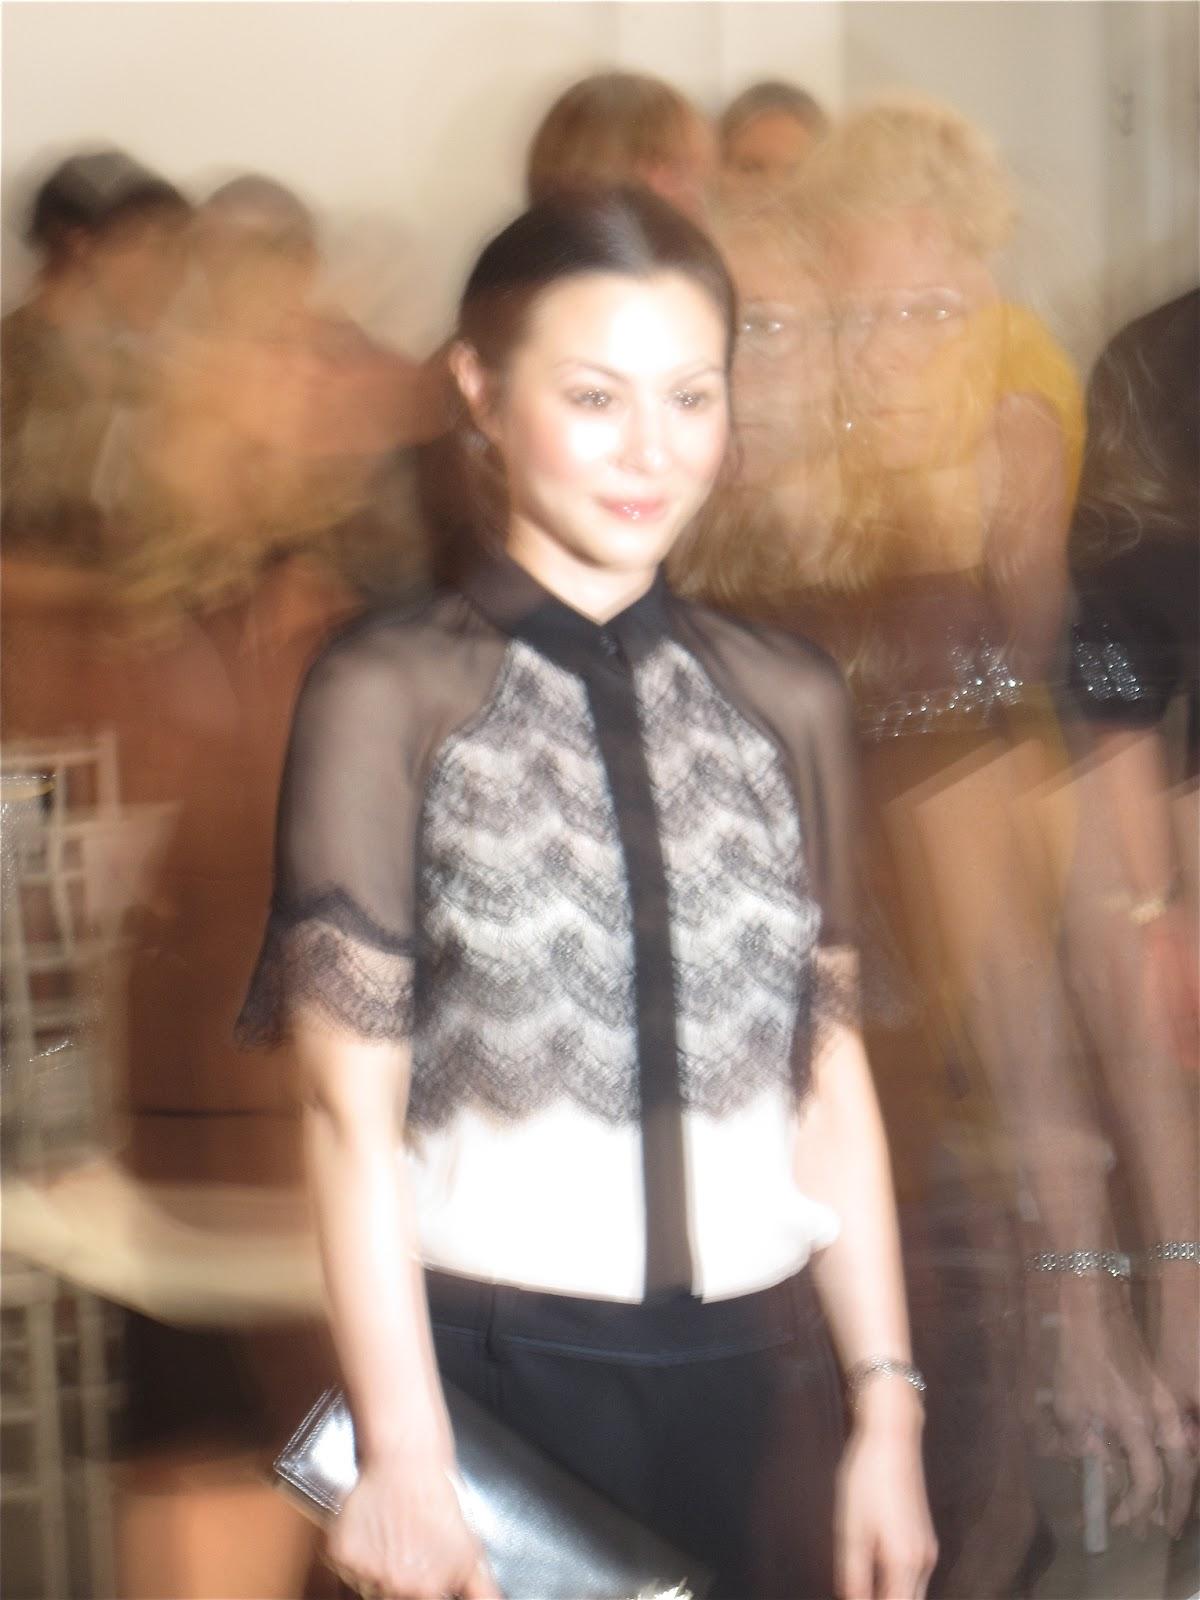 China Chow, Jason Wu S/S Show, Brizo New York Fashion Week